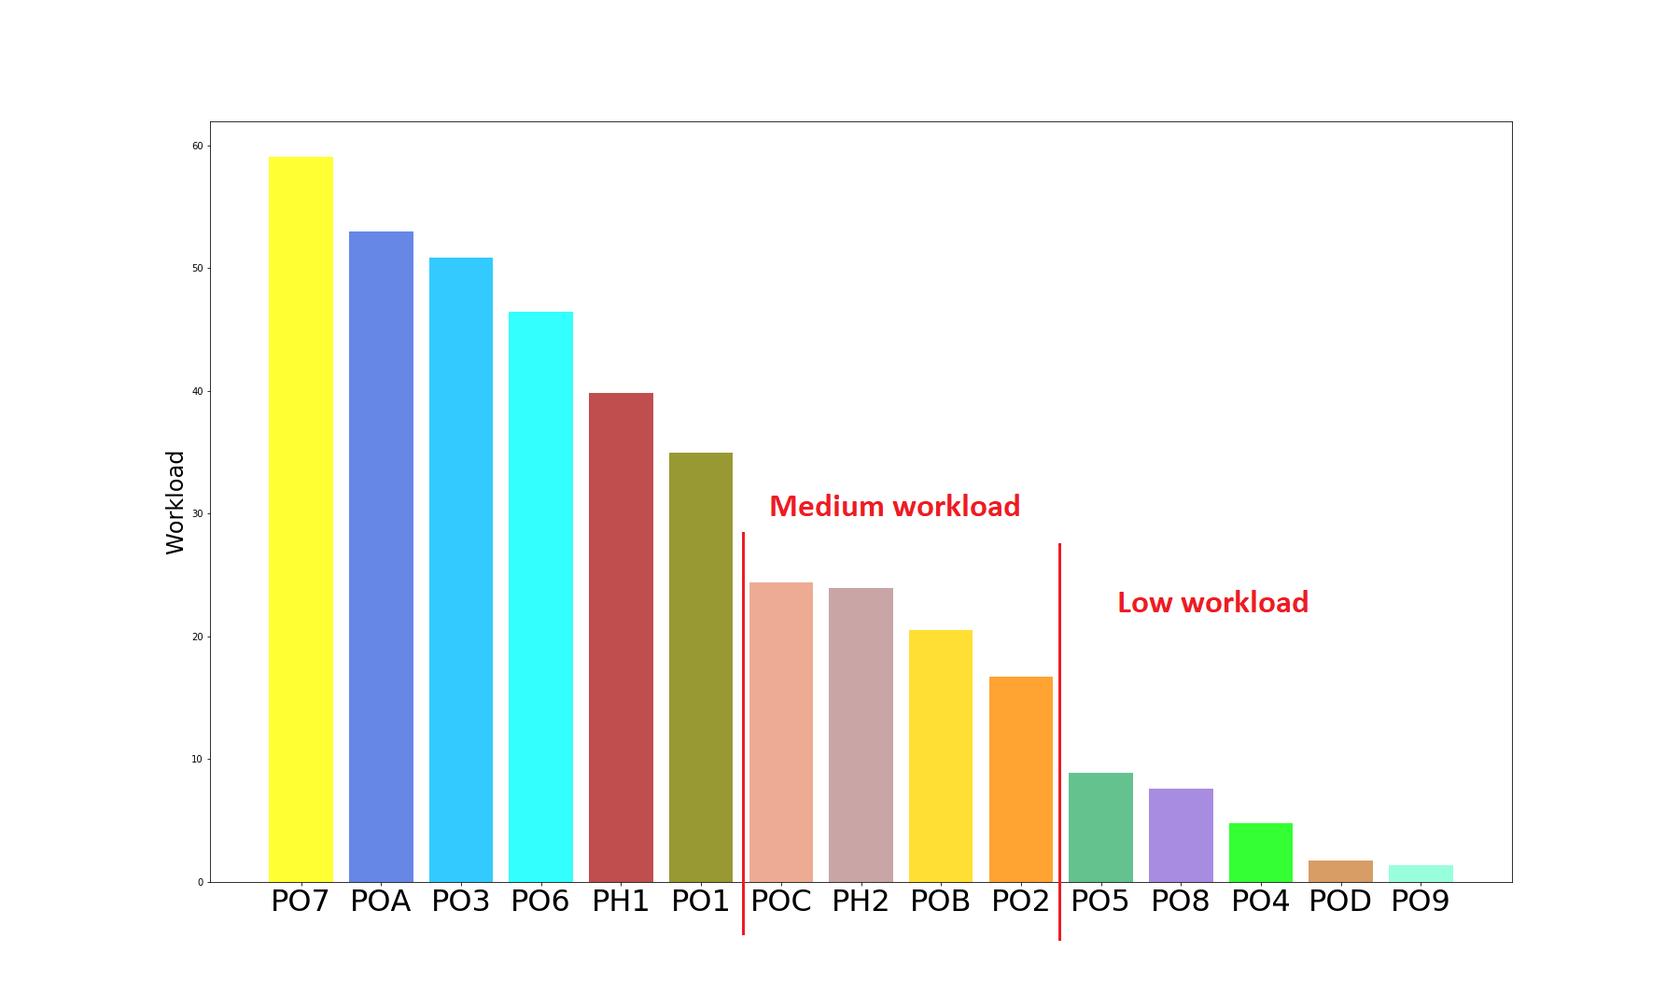 df_workload-1.png